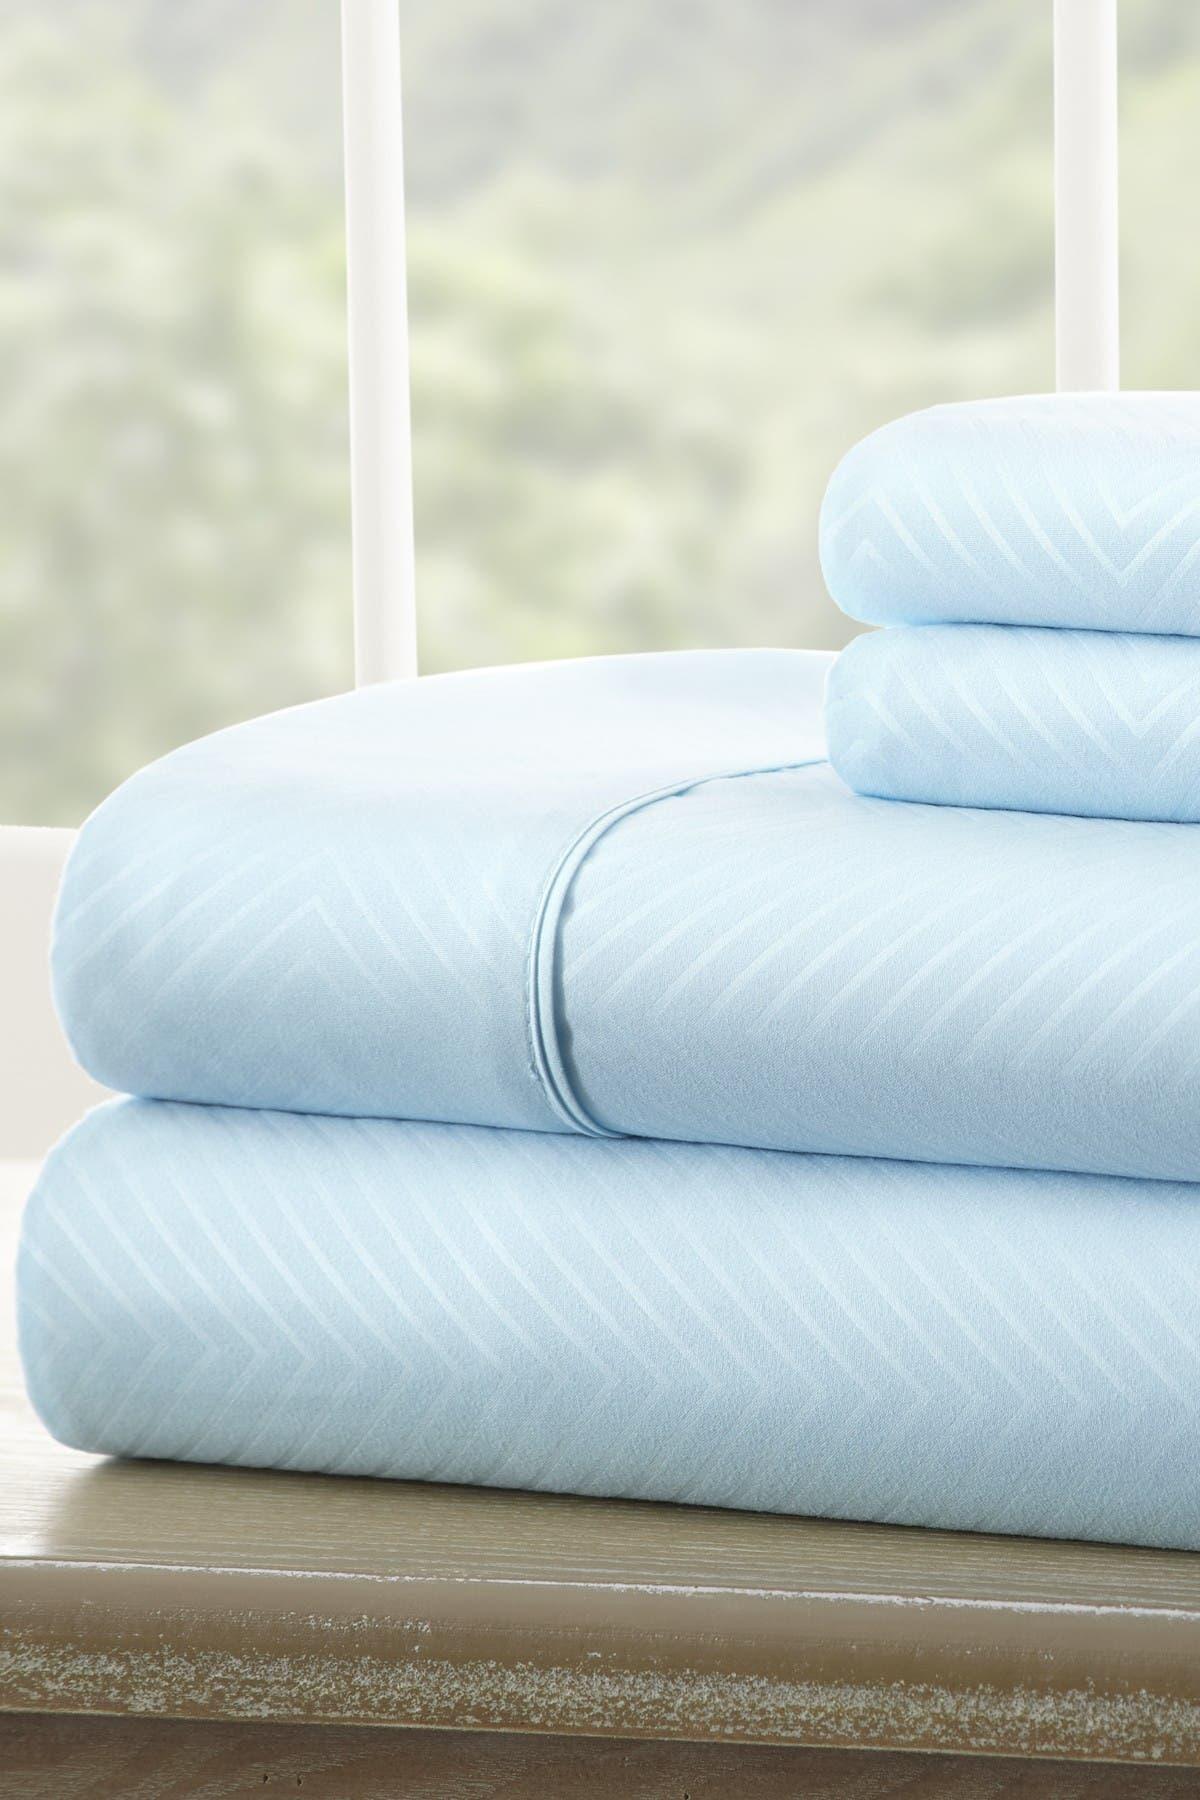 Image of IENJOY HOME King Hotel Collection Premium Ultra Soft 4-Piece Chevron Bed Sheet Set - Aqua